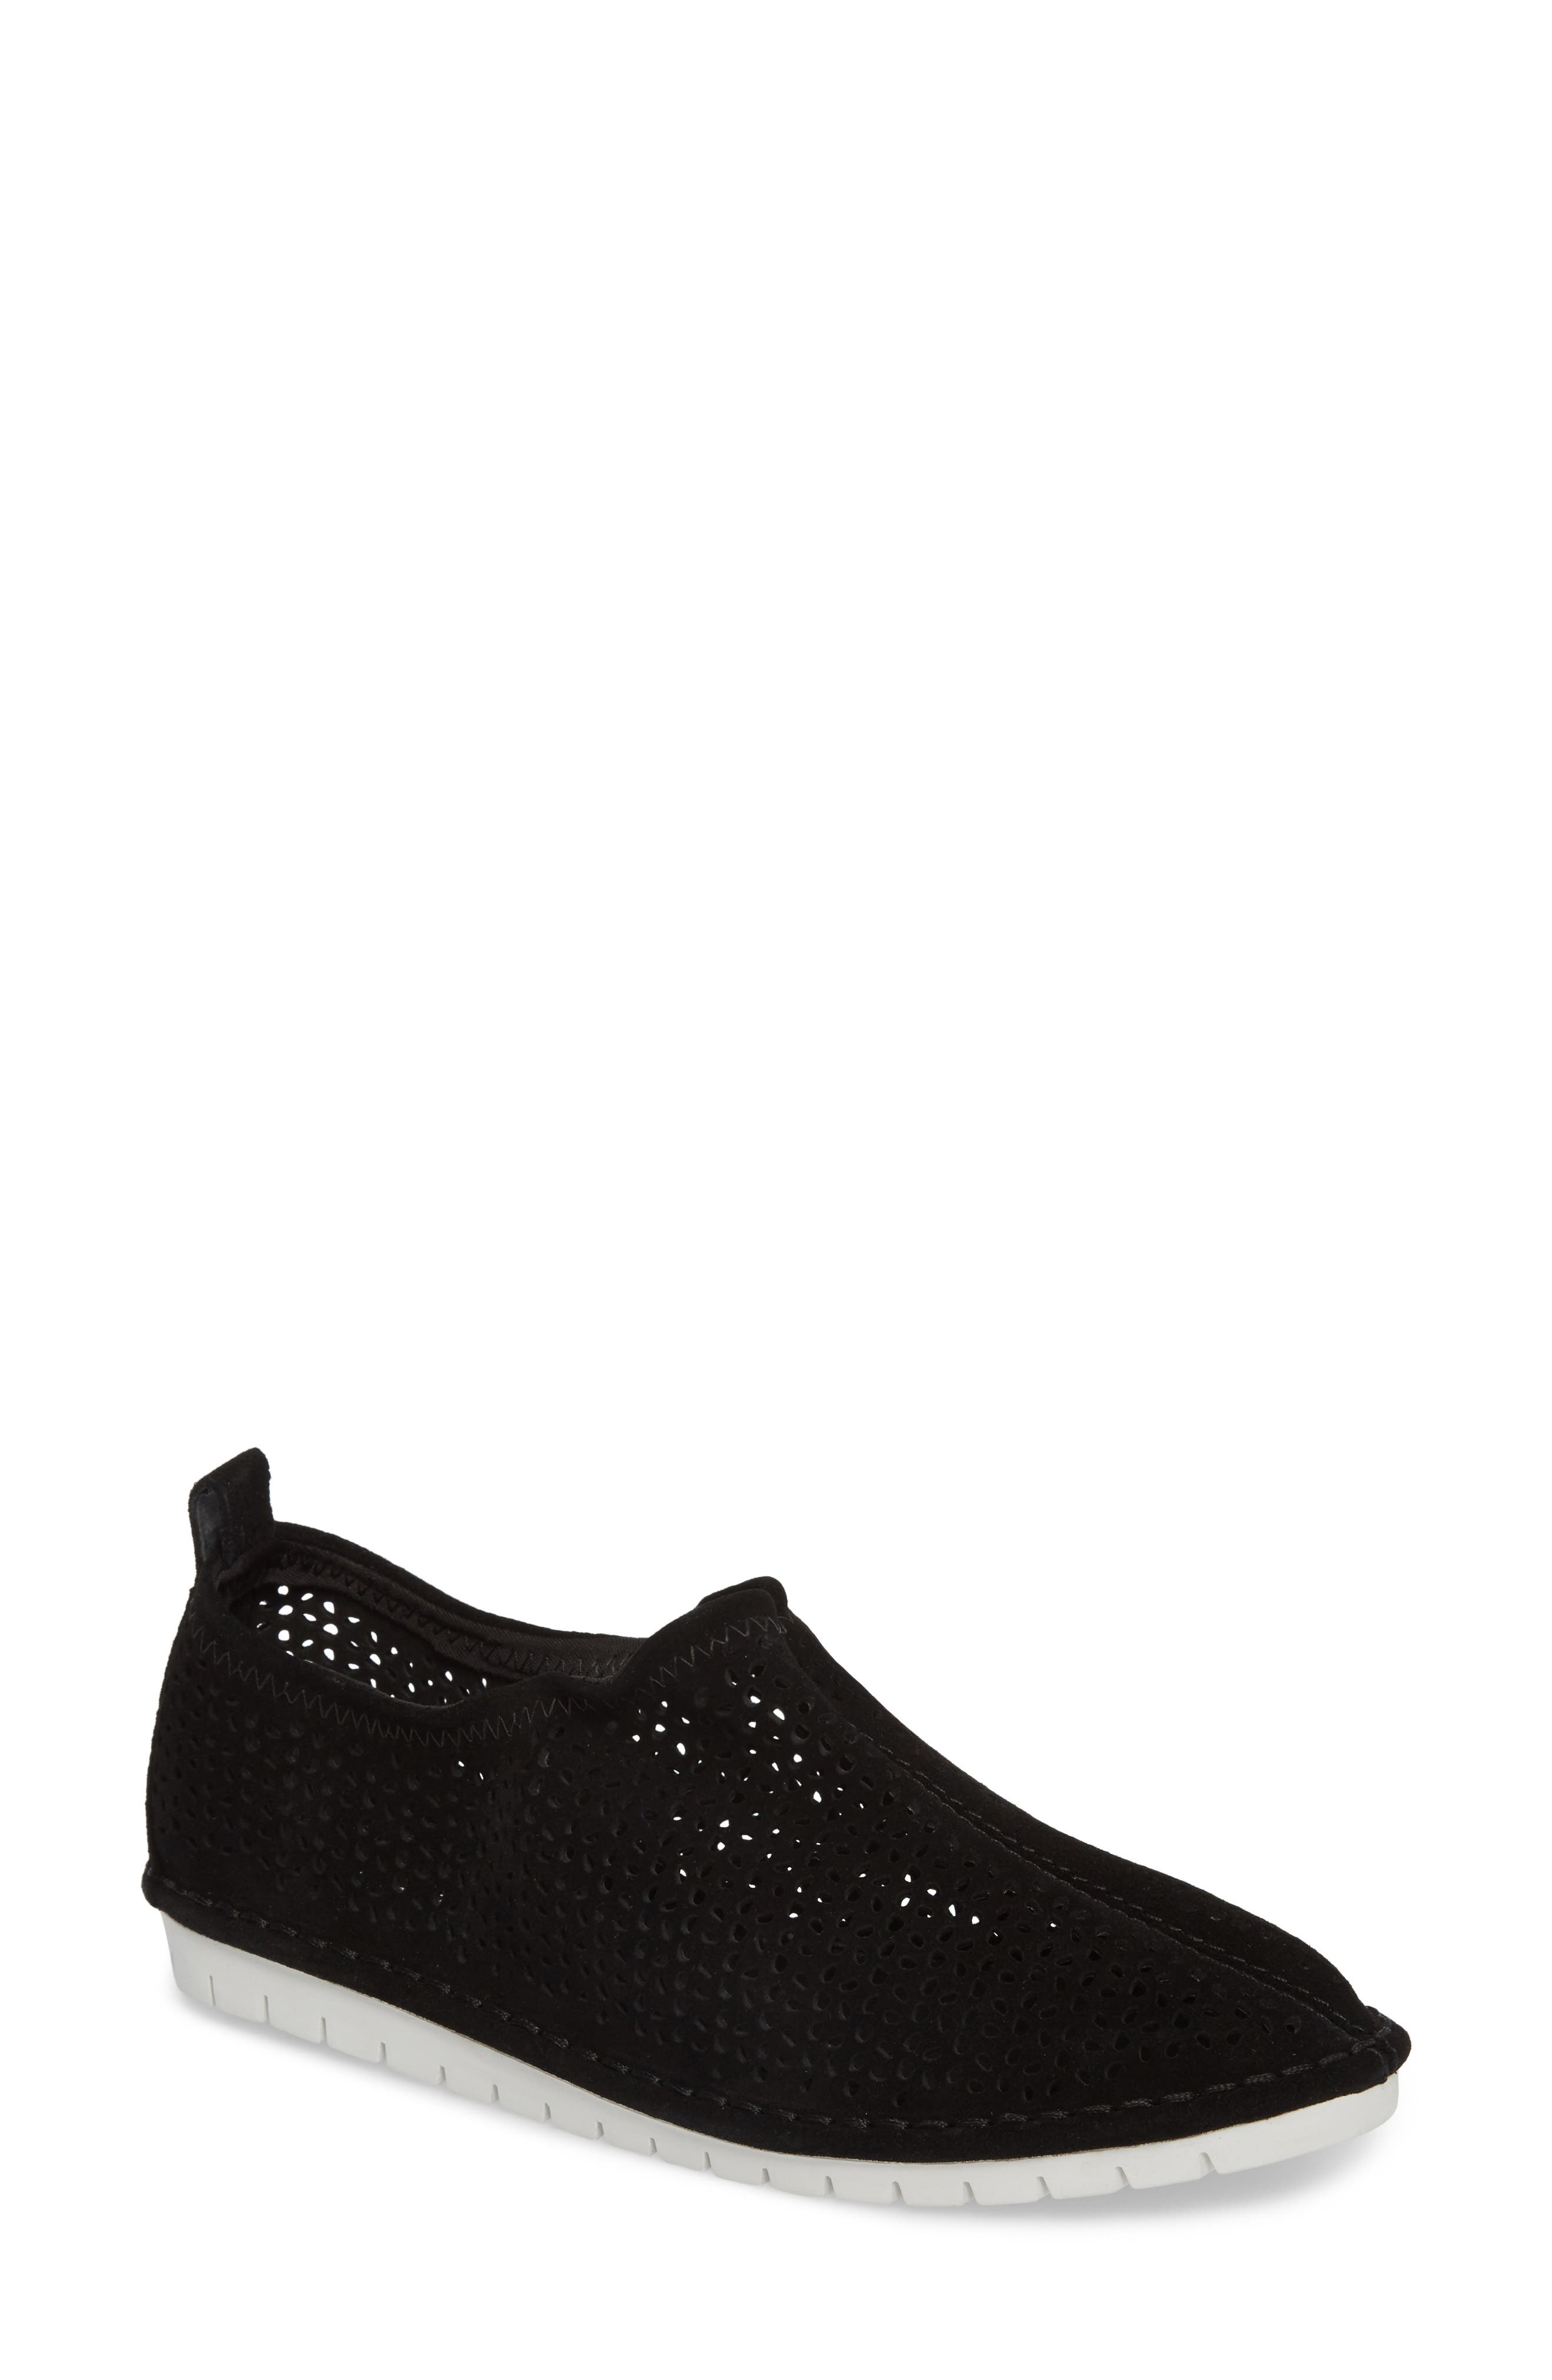 Royce Slip-On,                         Main,                         color, Black Suede